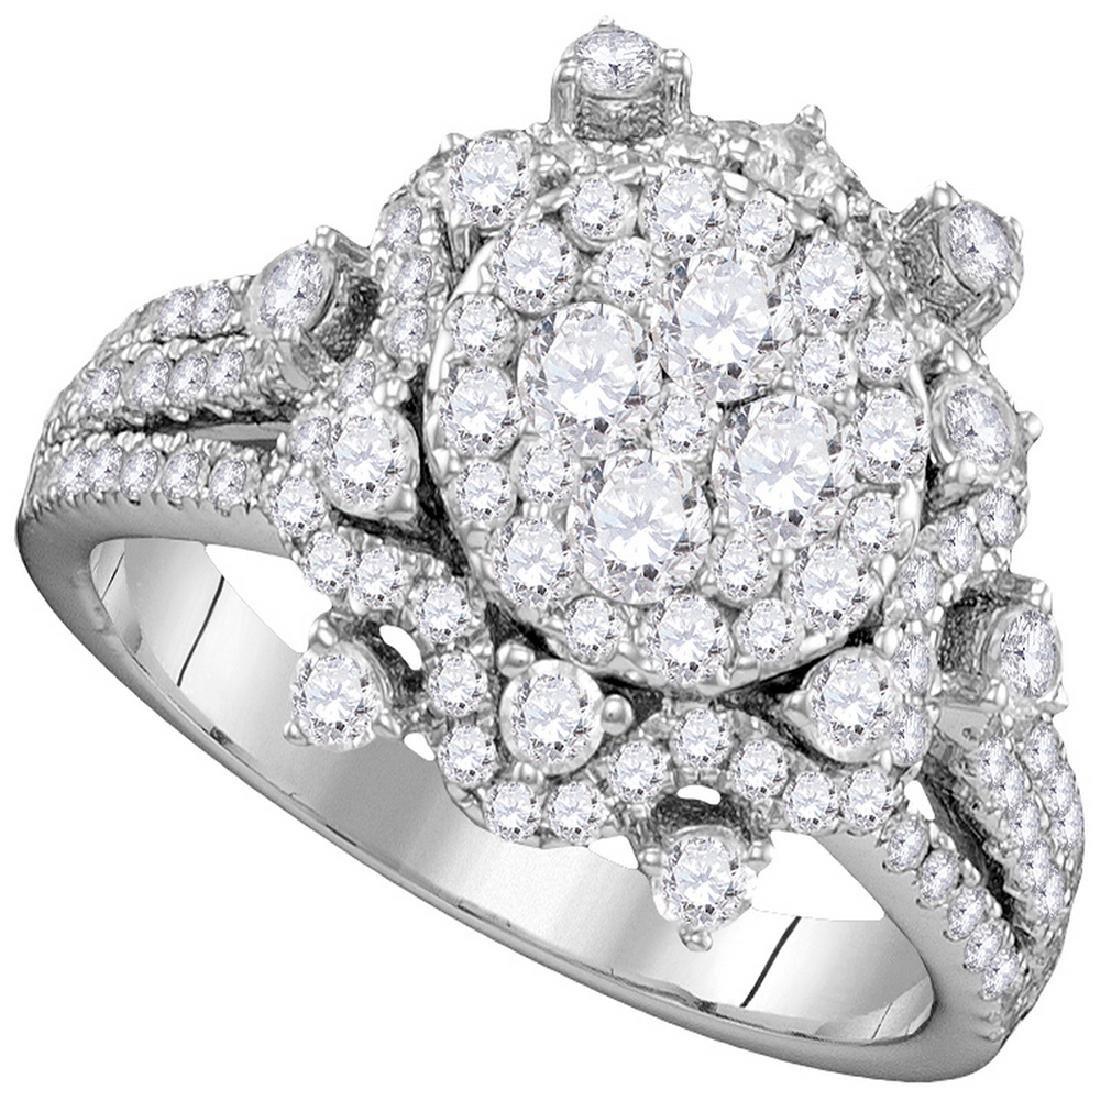 1.63 CTW Diamond Cluster Bridal Engagement Ring 14KT